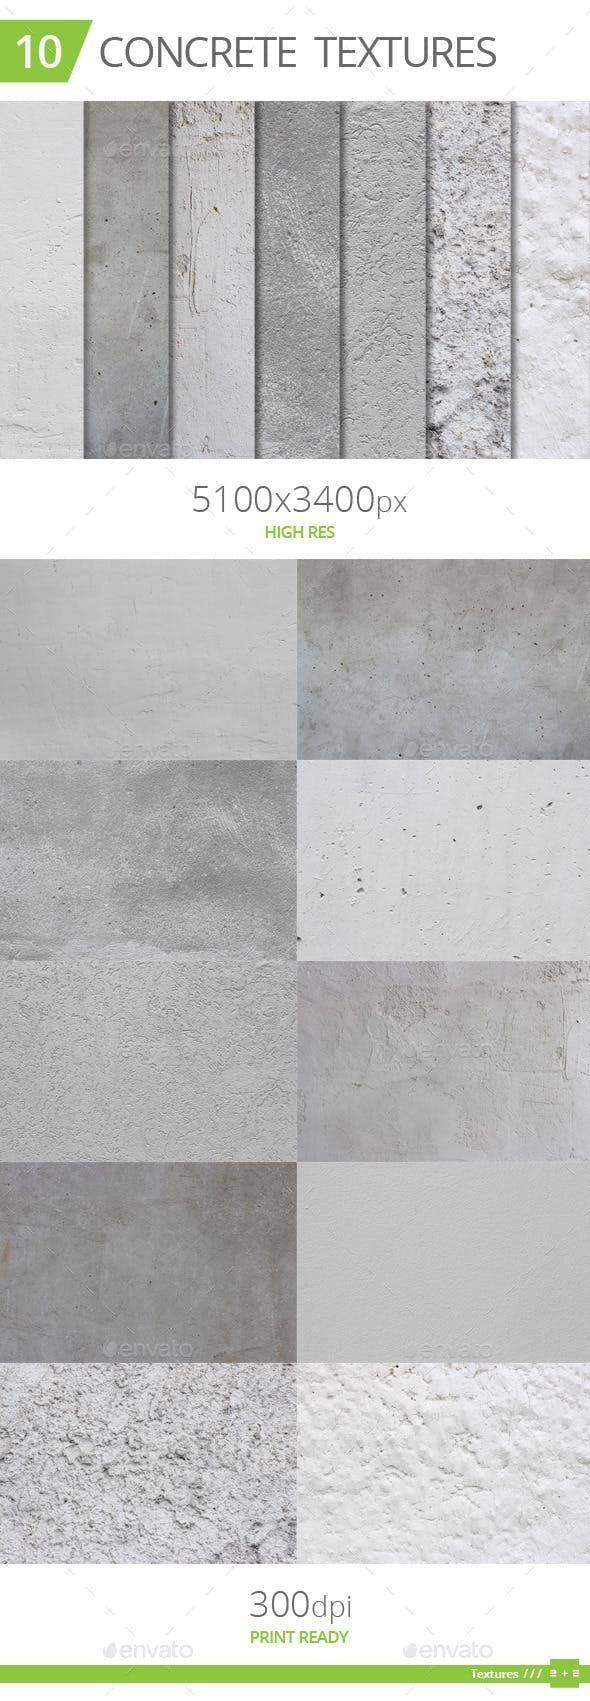 10 Concrete Textures Concrete Texture Concrete Wall Texture Texture Graphic Design